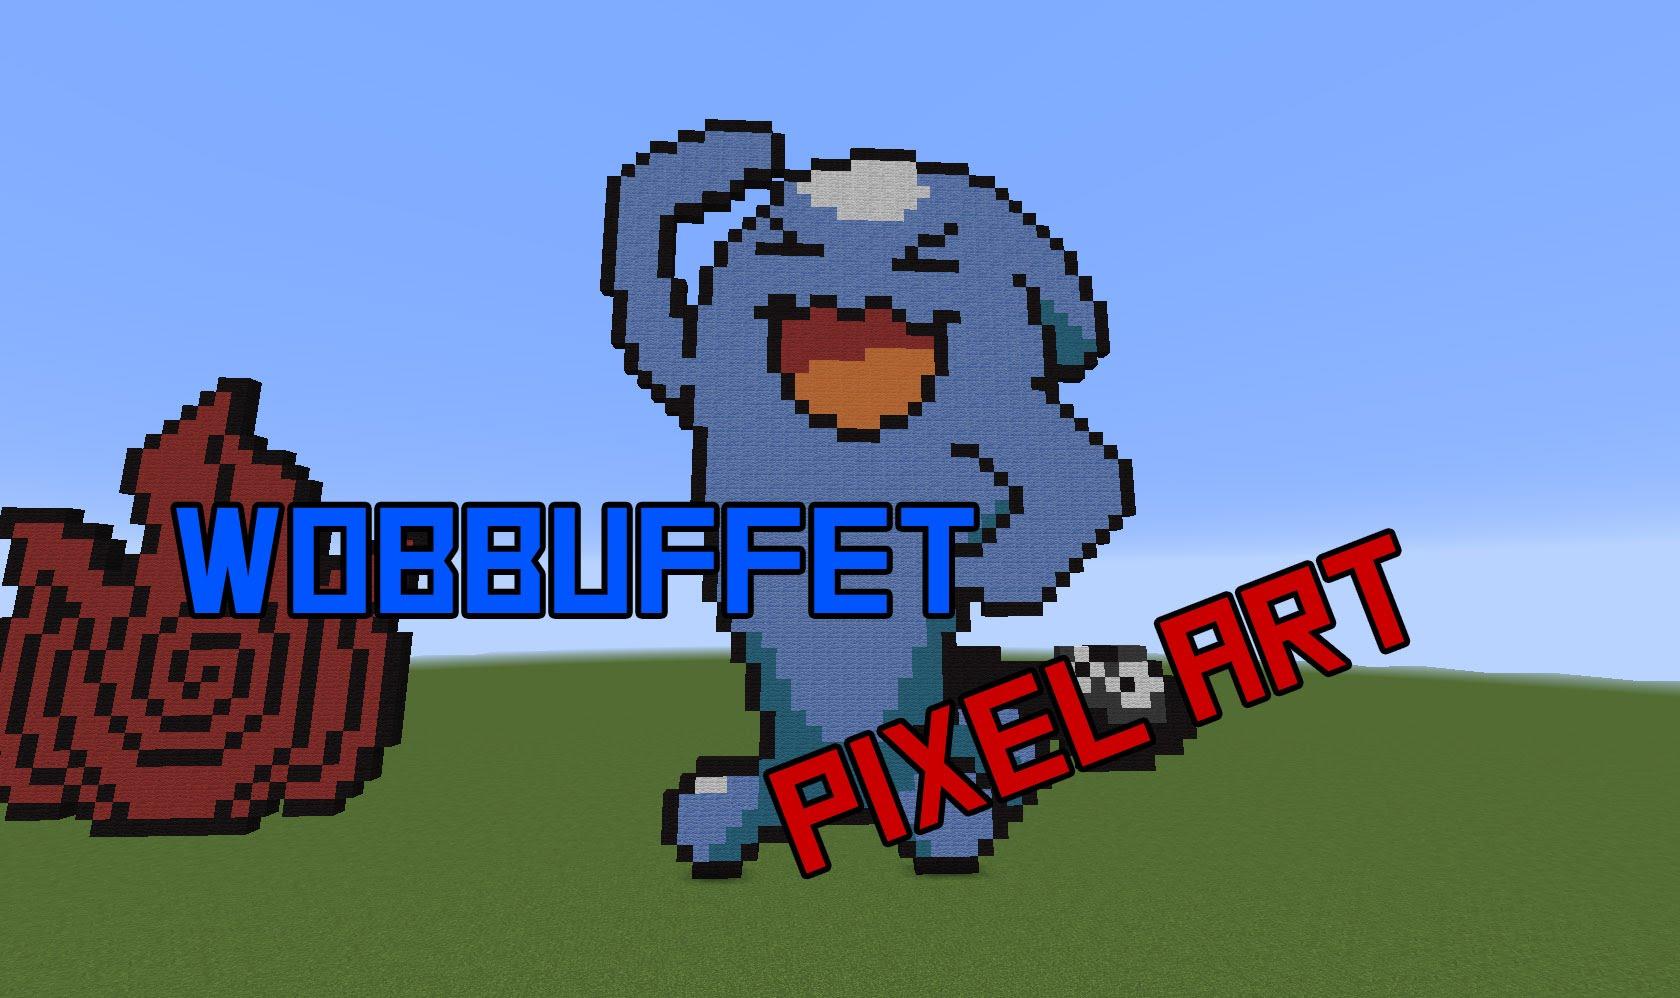 Drawn pixel art wobbuffet Art Art Pixel Speed YouTube